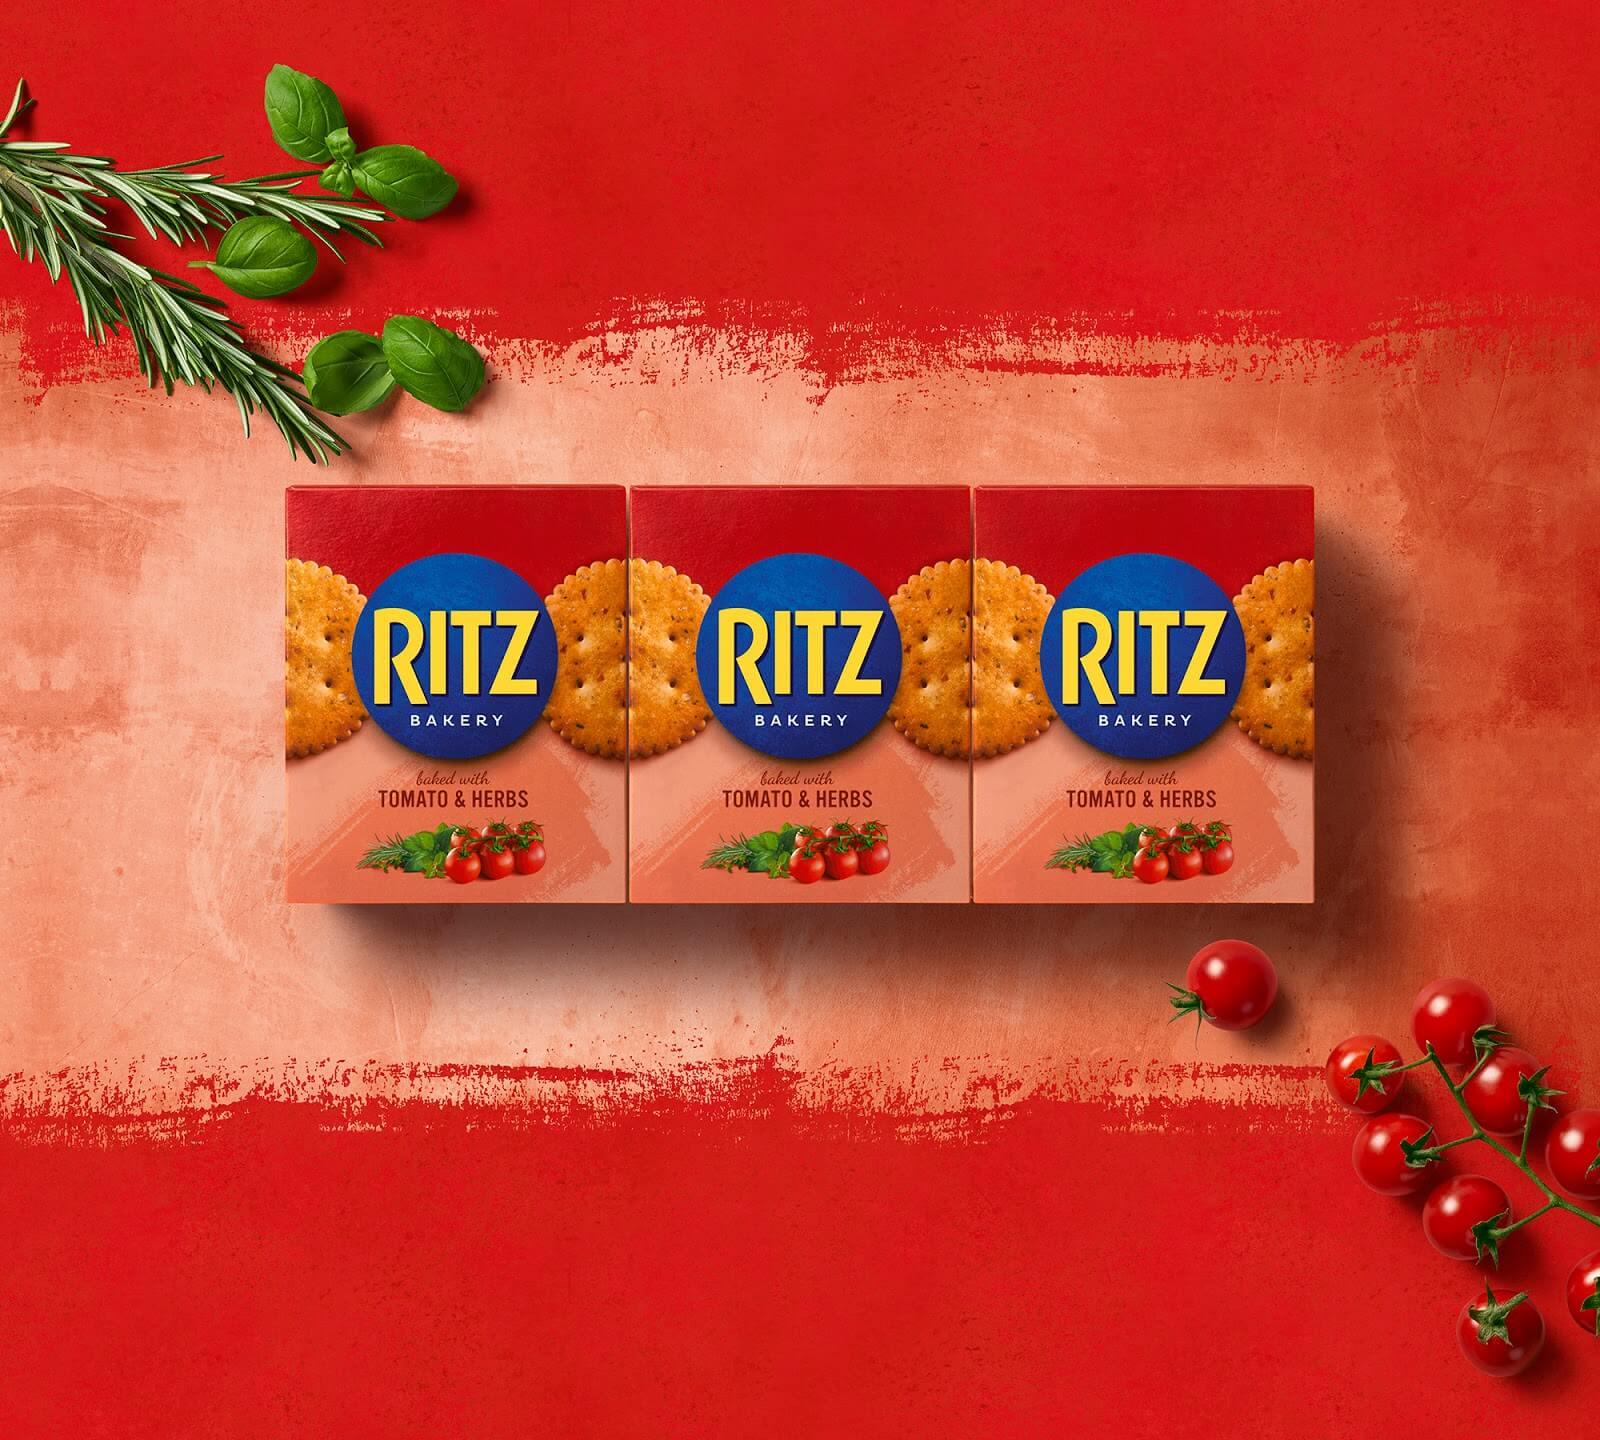 ritz family pr page 4 lowres - Nový redesign krekrů Ritz